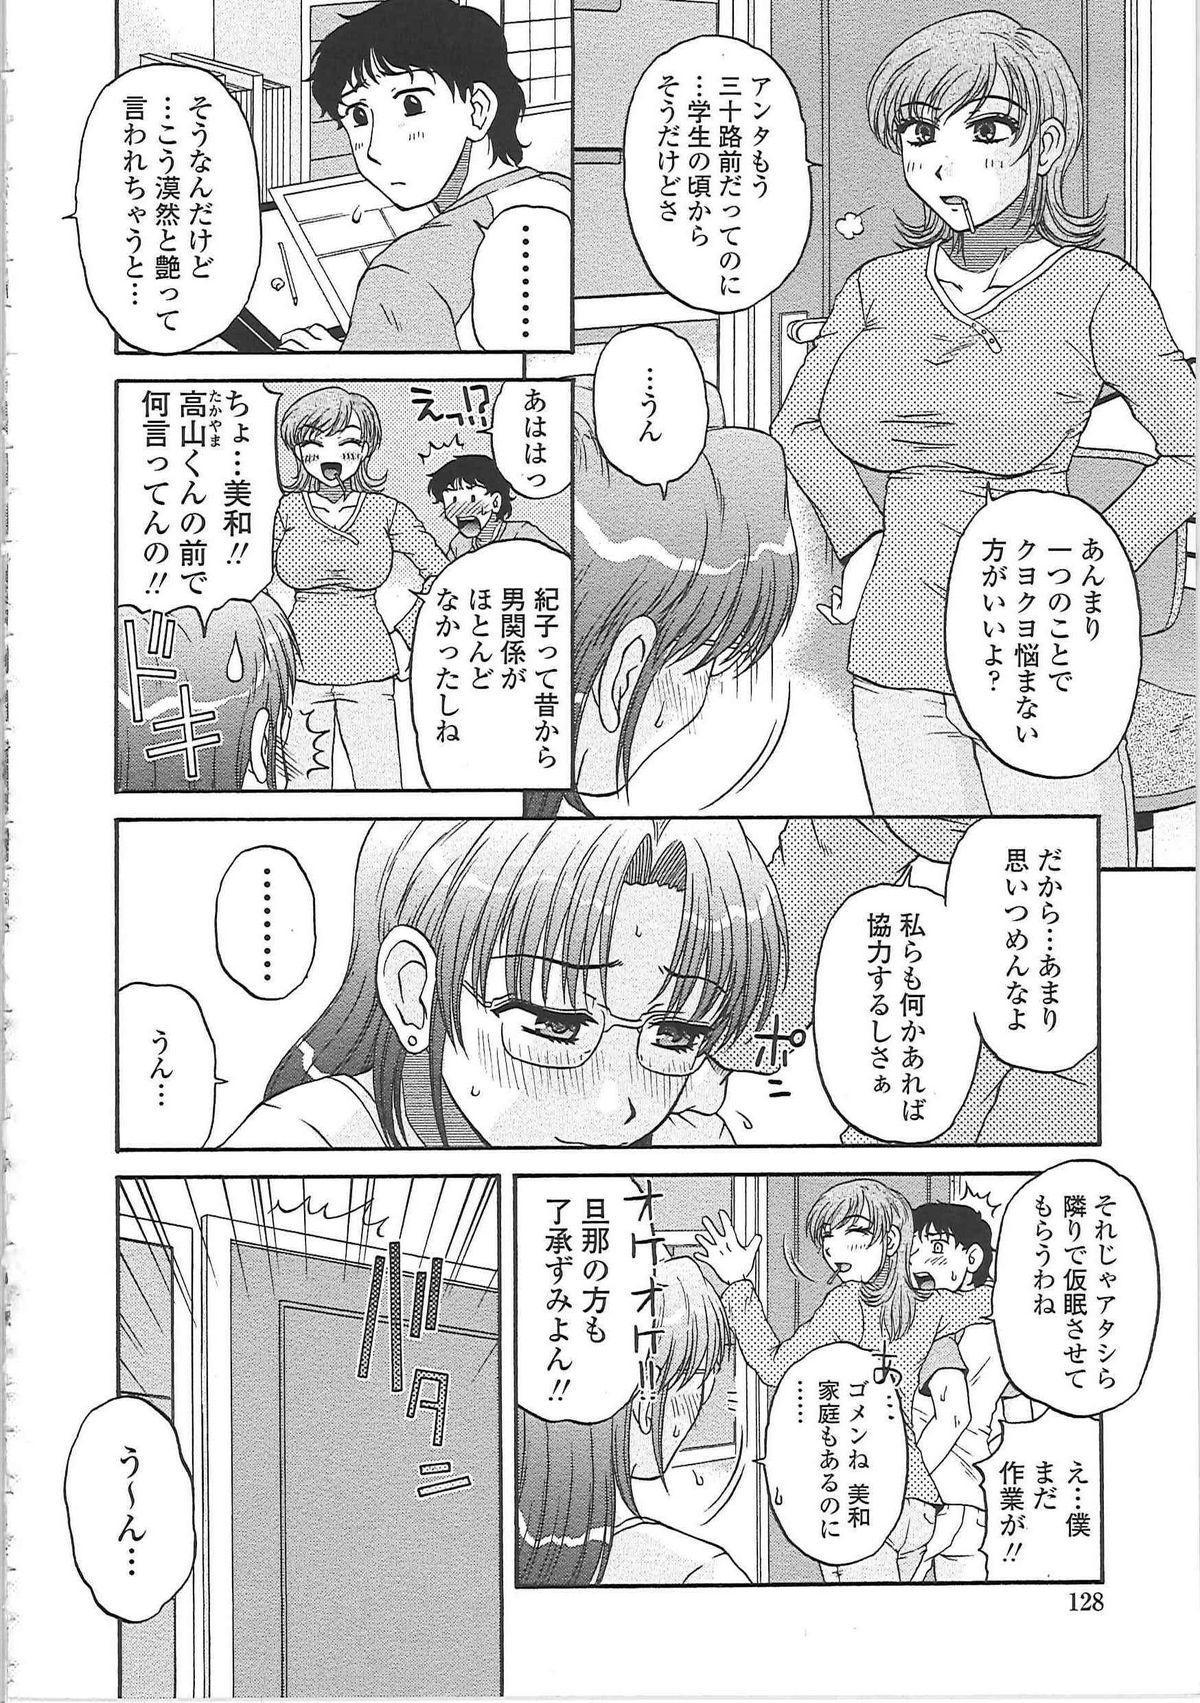 Nikuzuma Tsuushin - Erotic Wife Communication 132